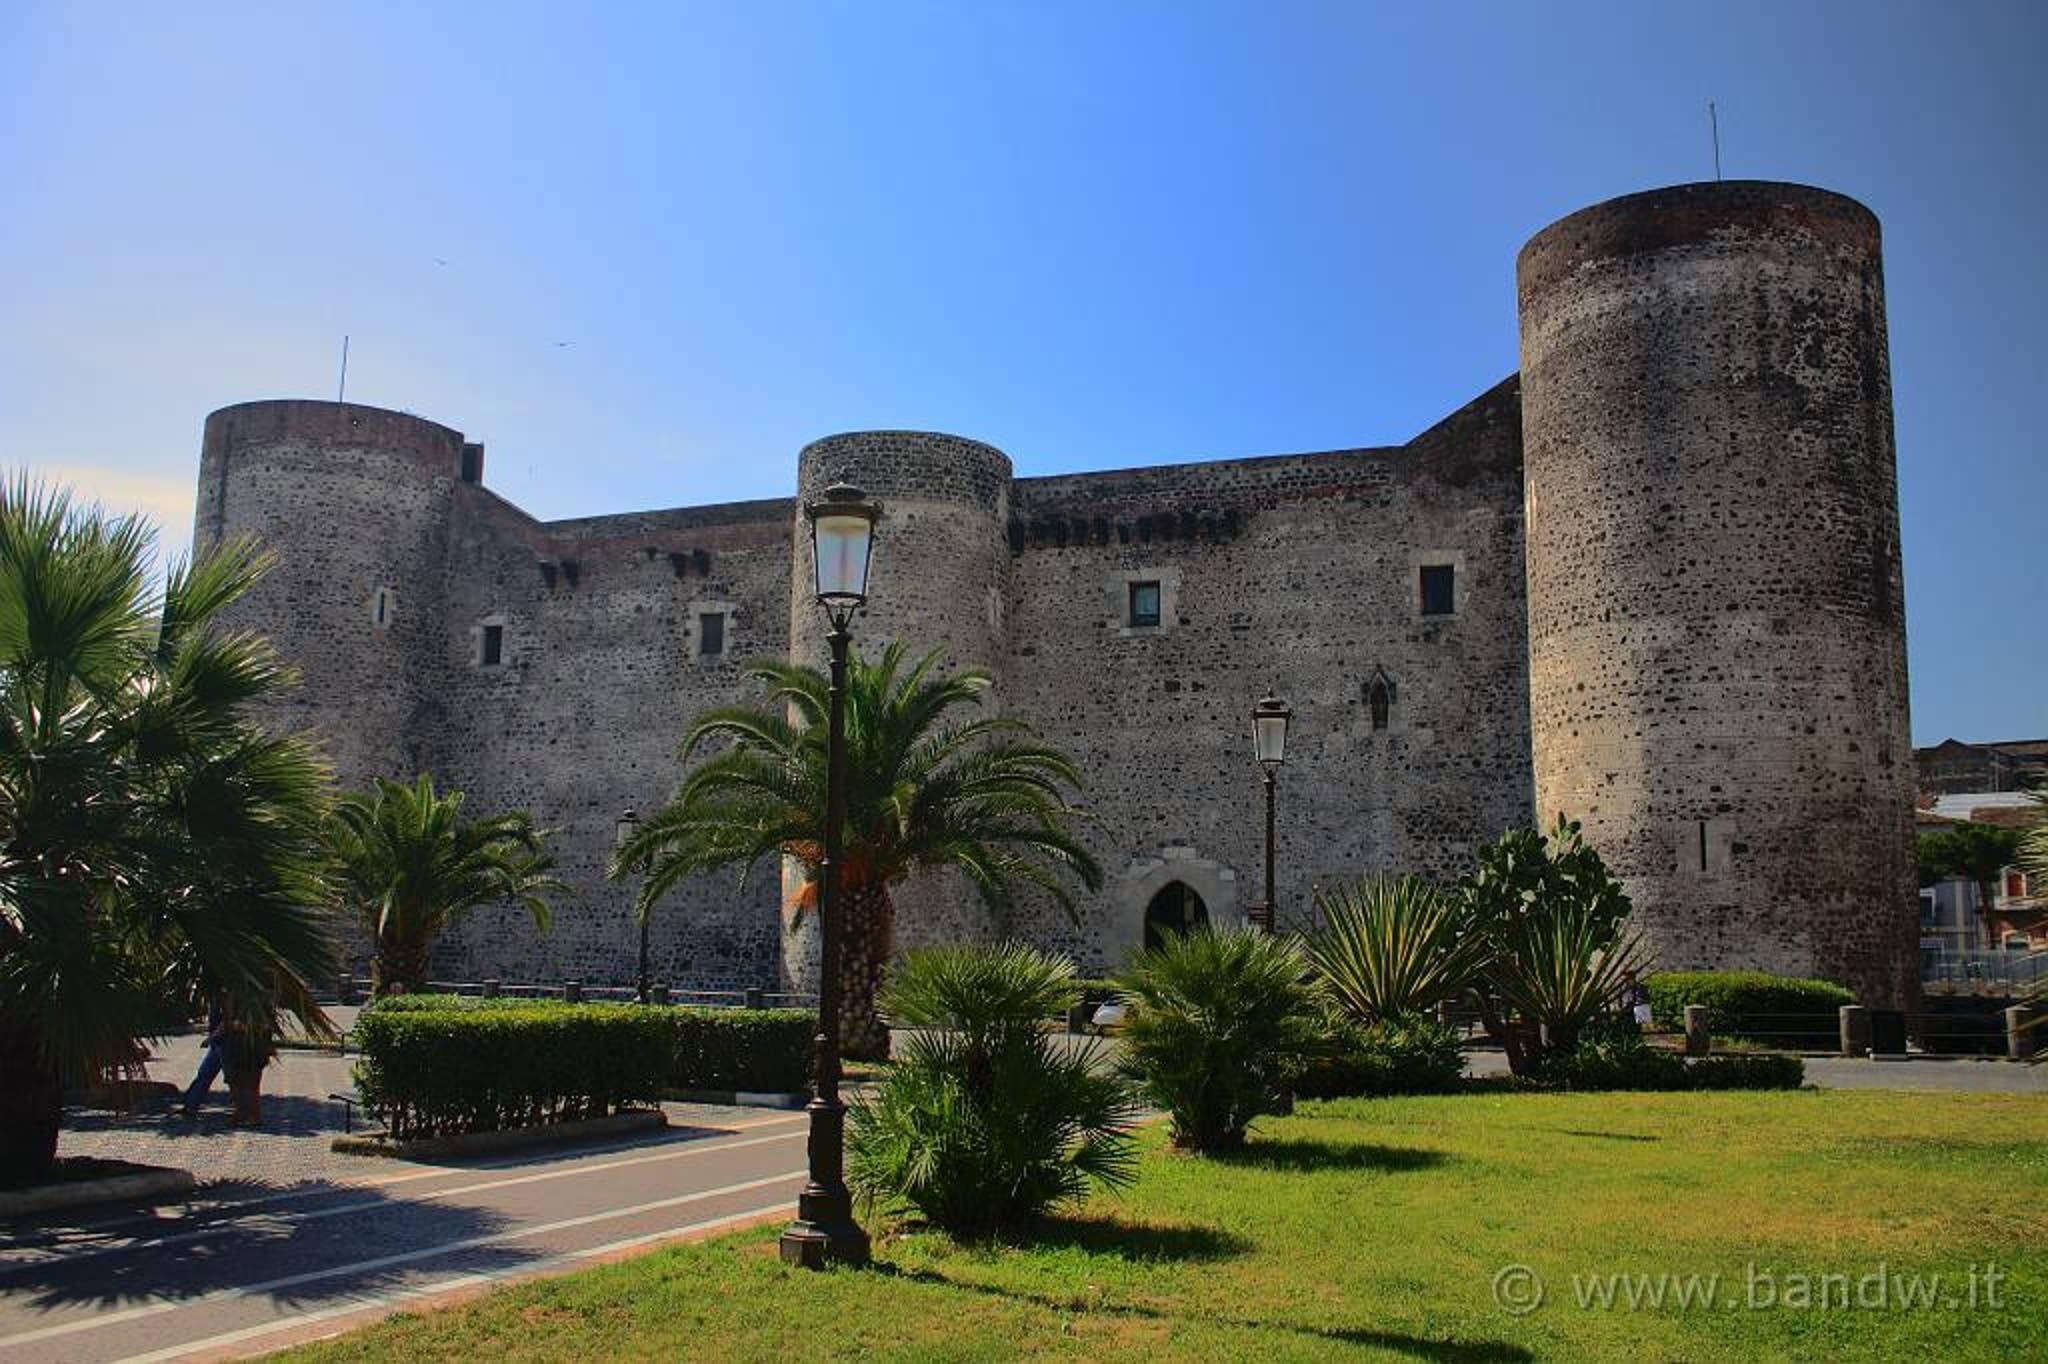 Maison de vacances  (2782175), Catania, Catania, Sicile, Italie, image 25